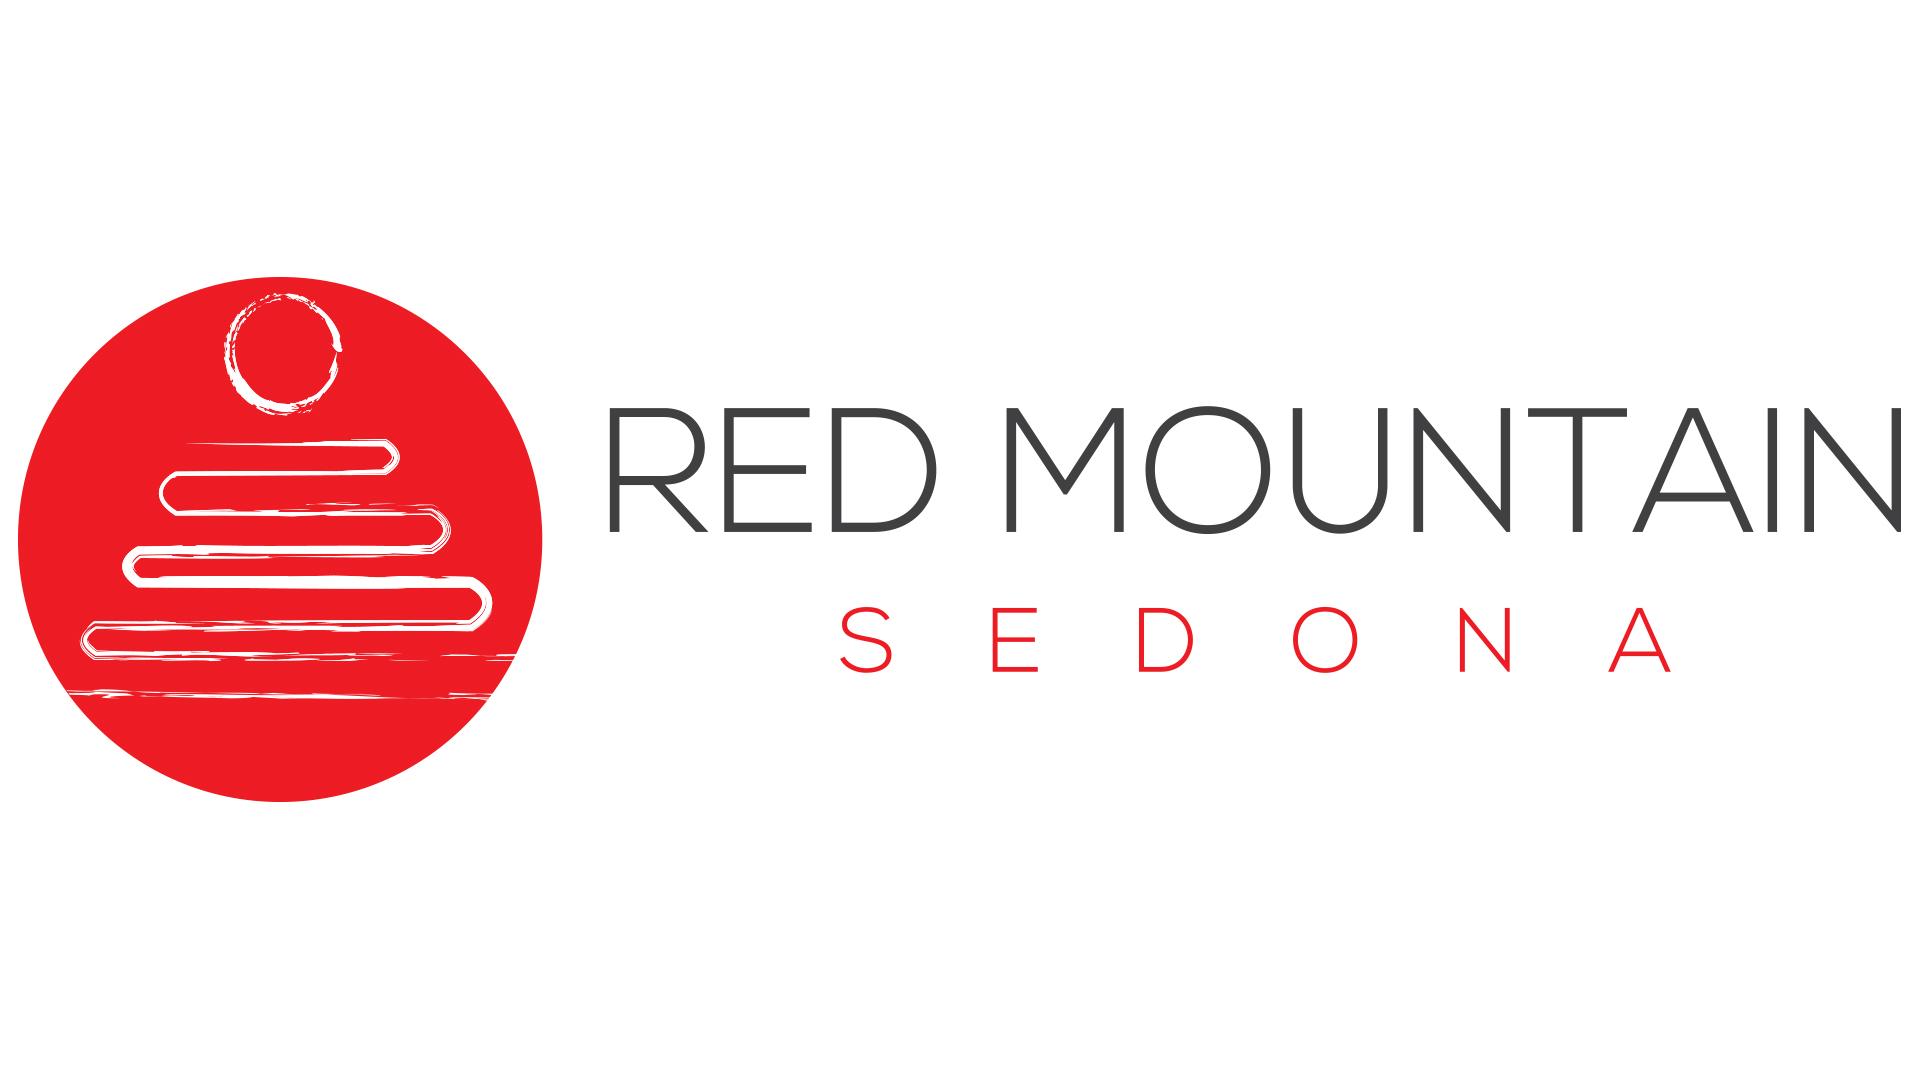 Red Mountain Sedona